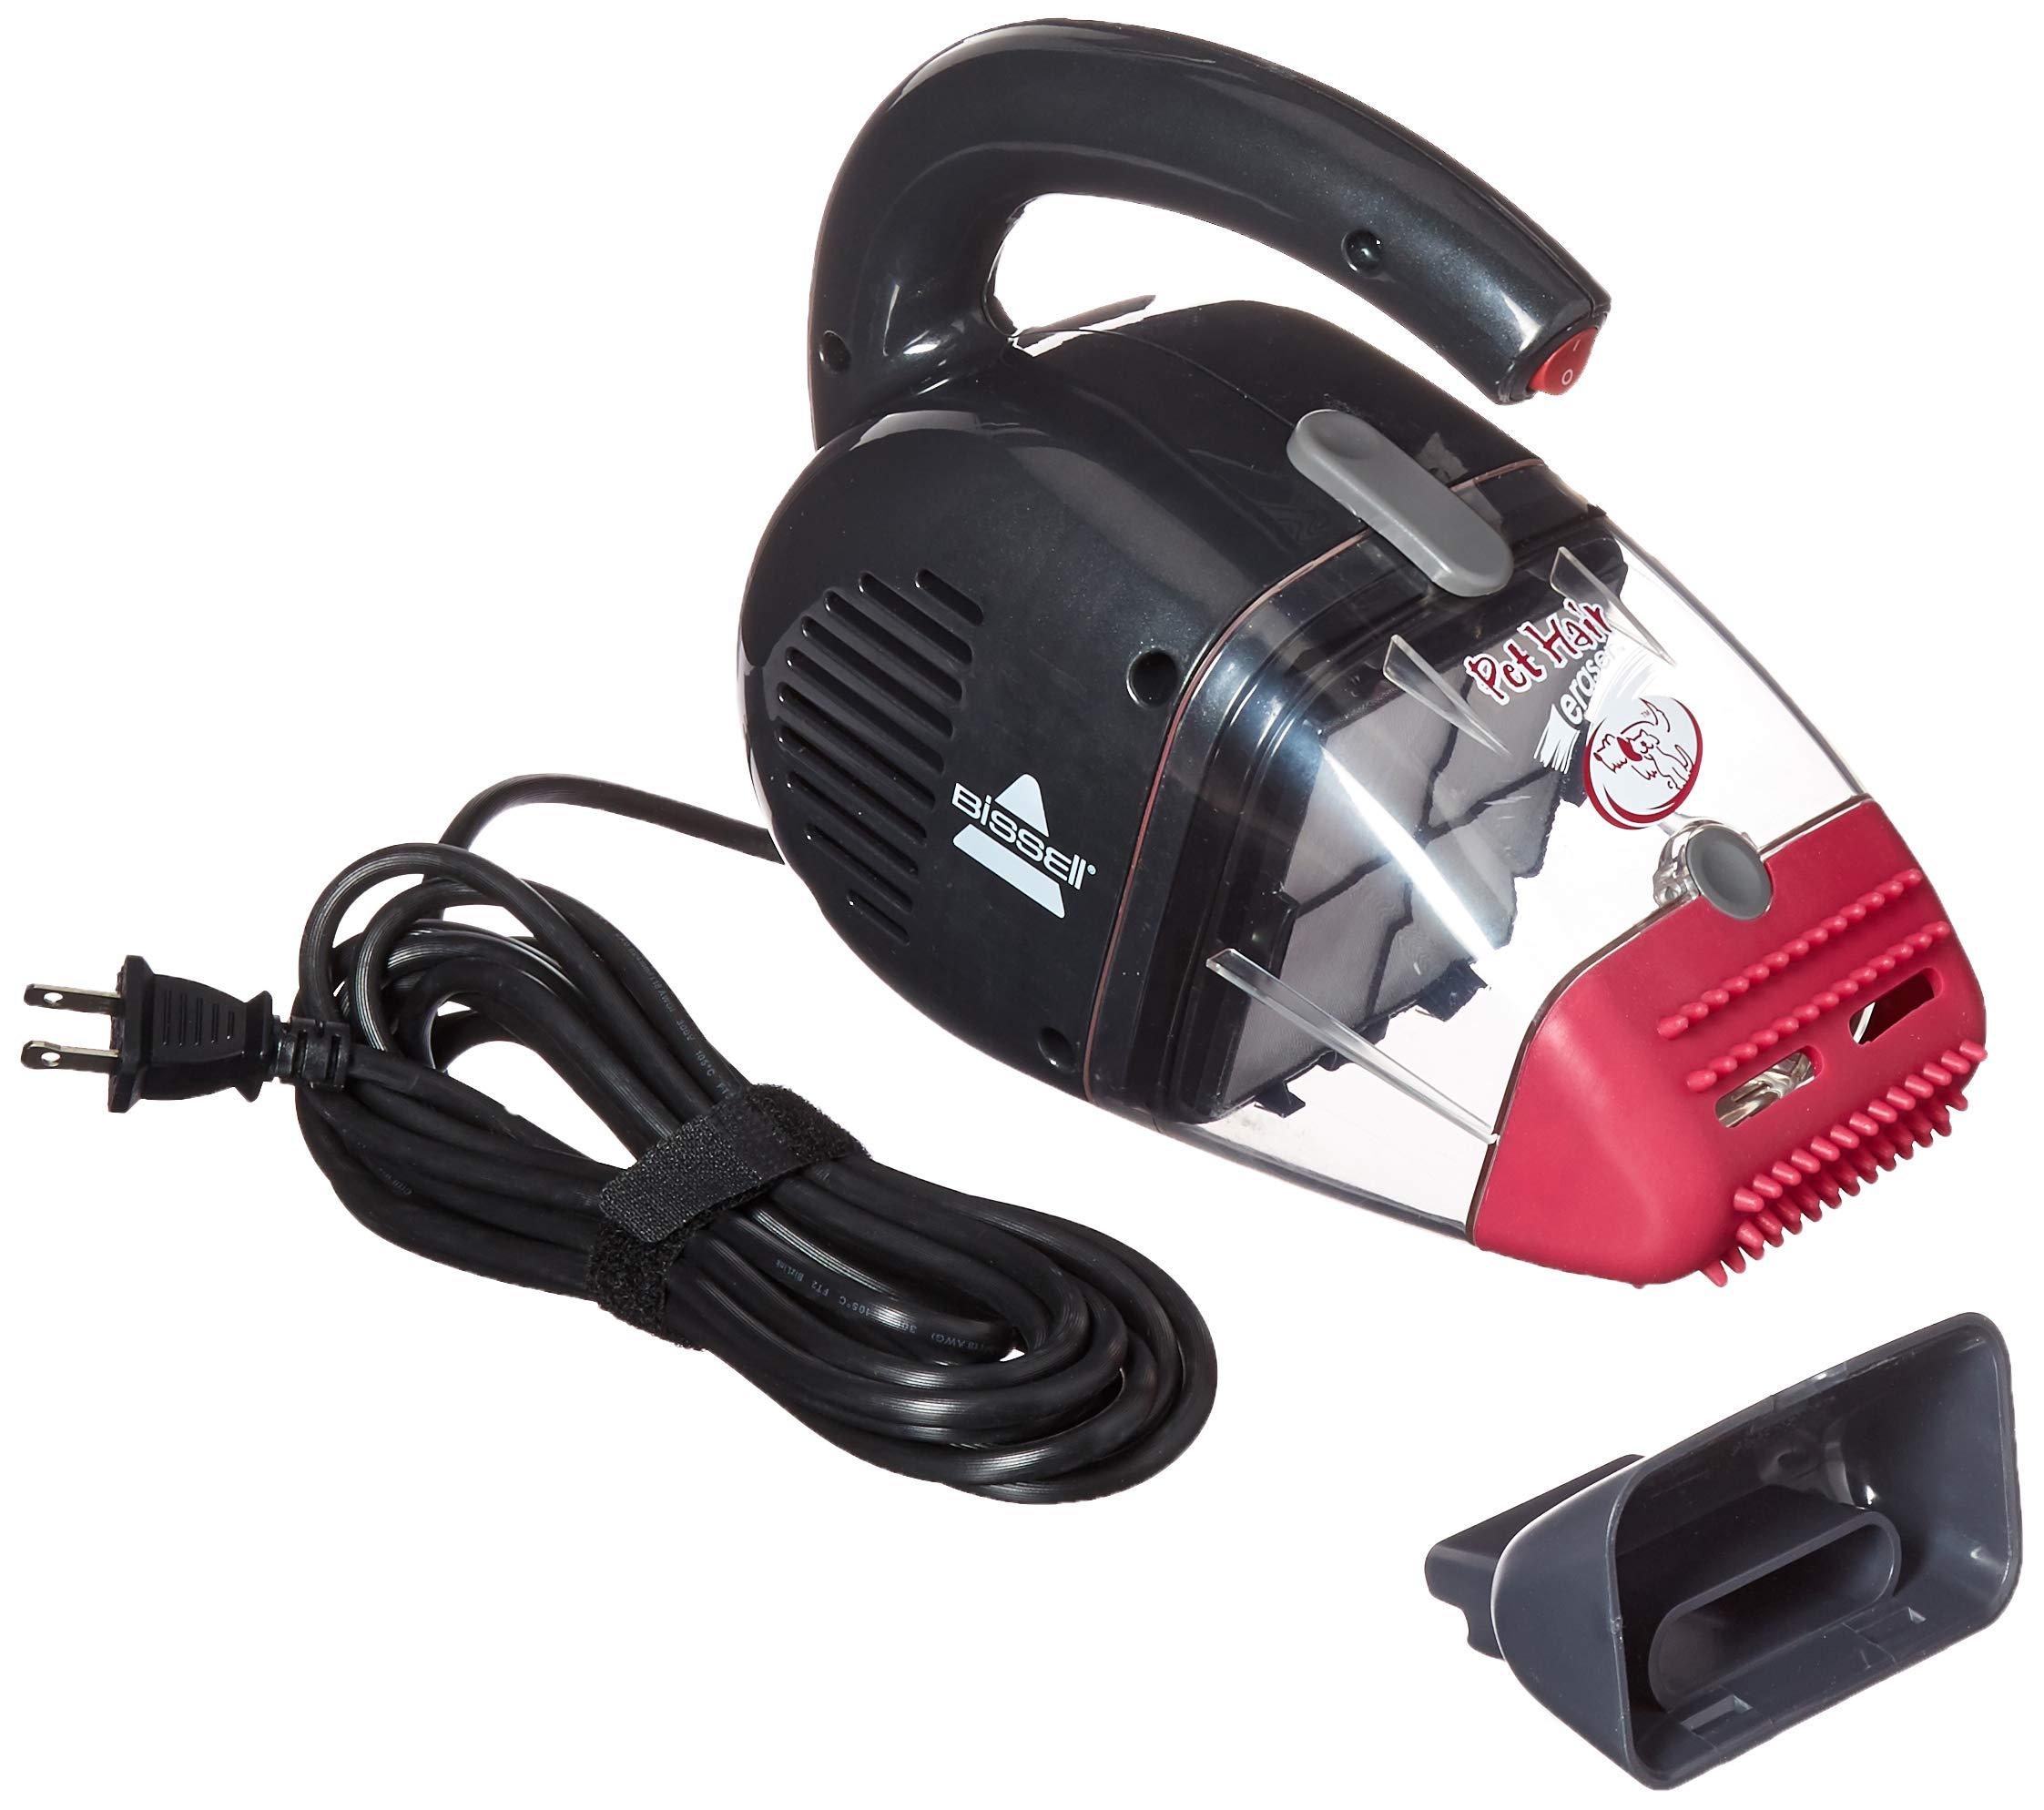 Bissell Eraser Handheld Vacuum Corded